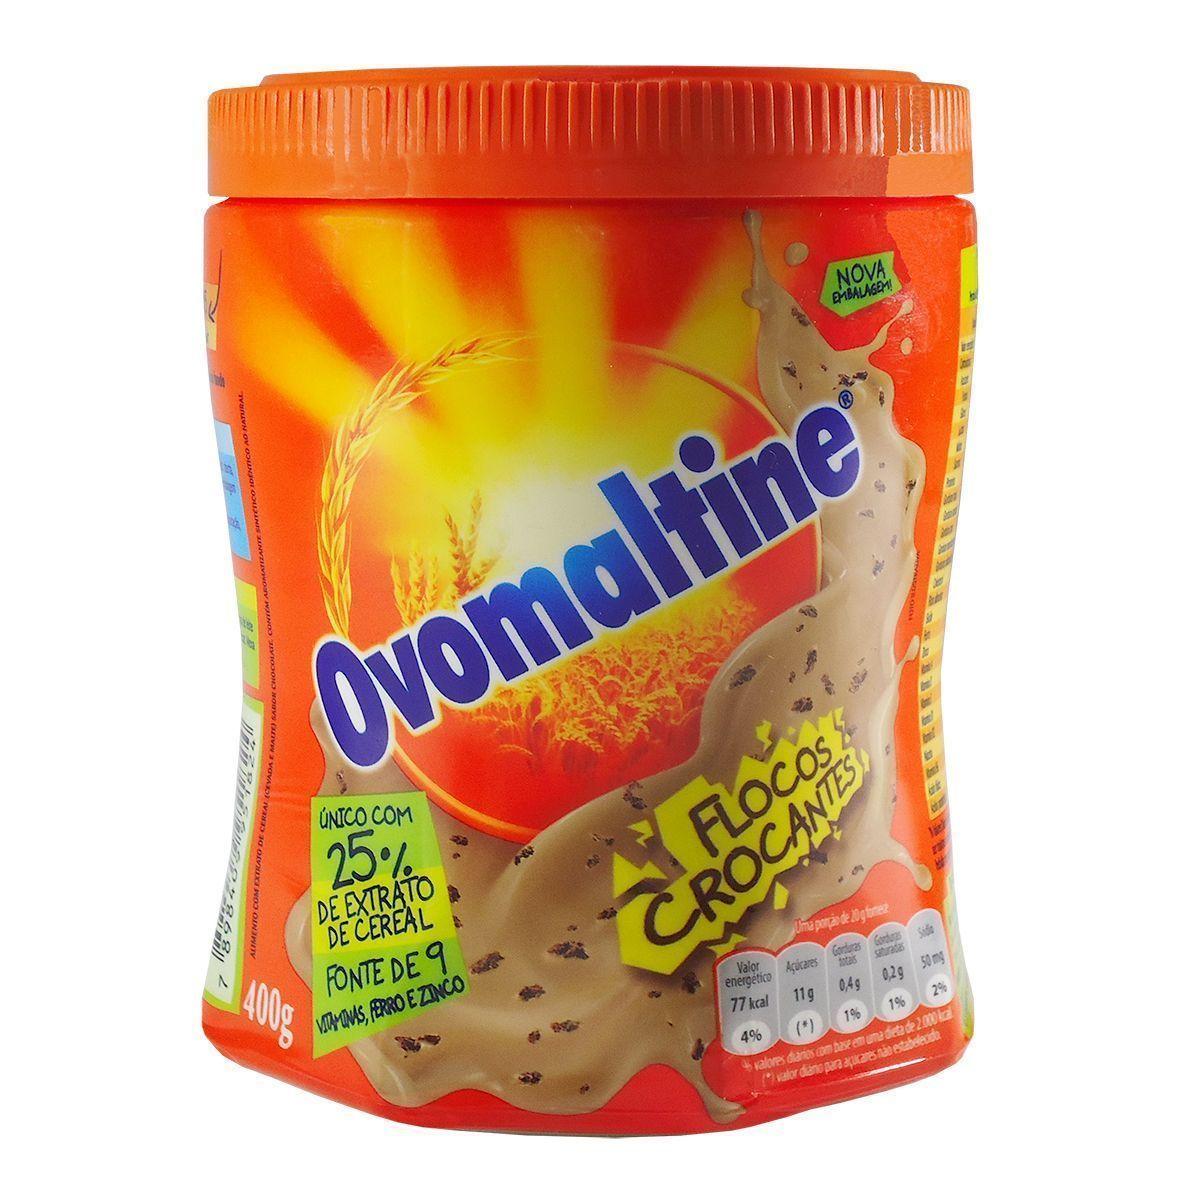 Achocolatado em Pó flocos crocantes 400g Ovomaltine pote POTE